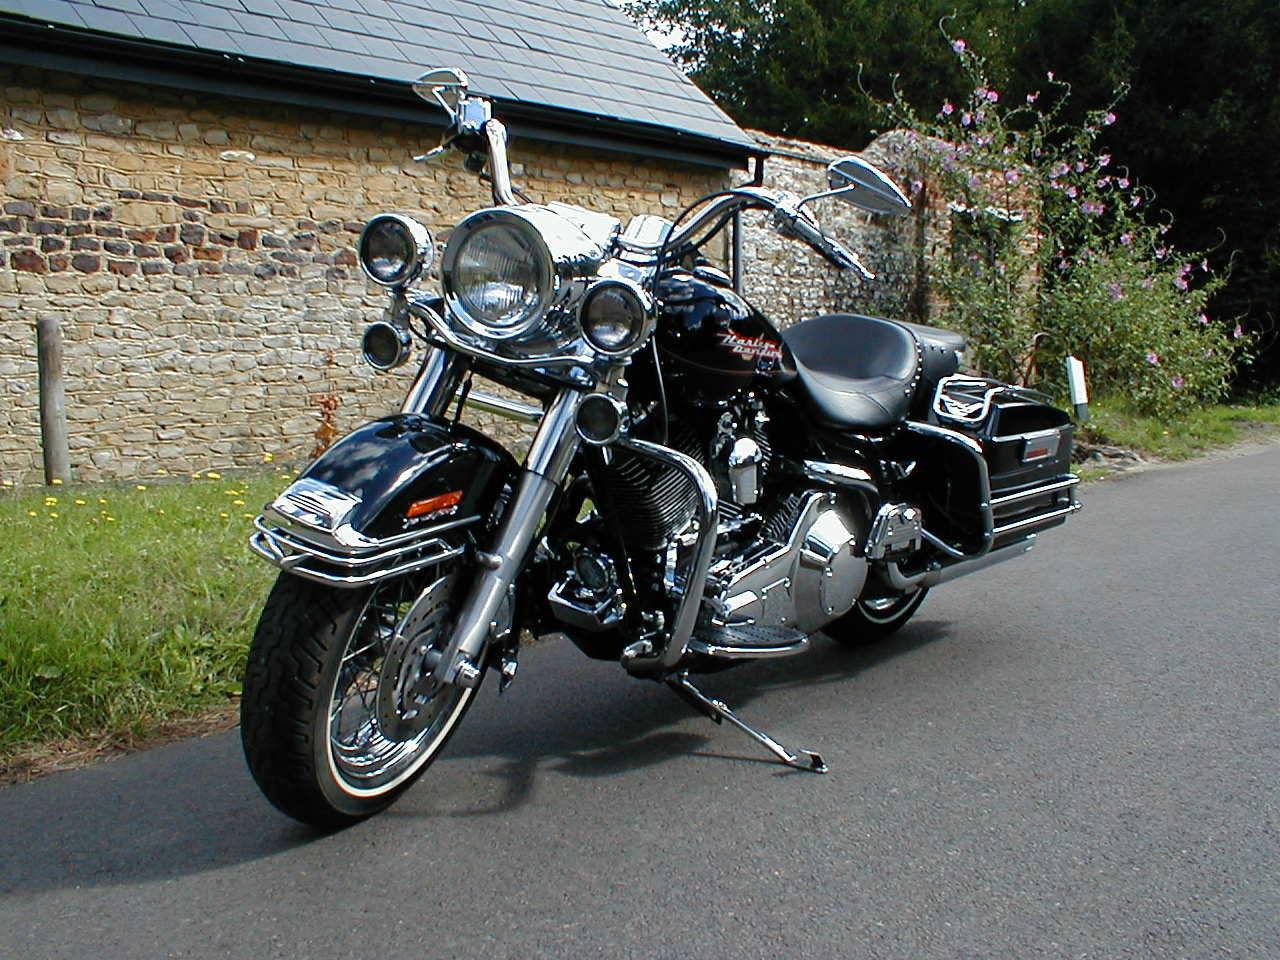 Harley Davidson Dash Warning Lights